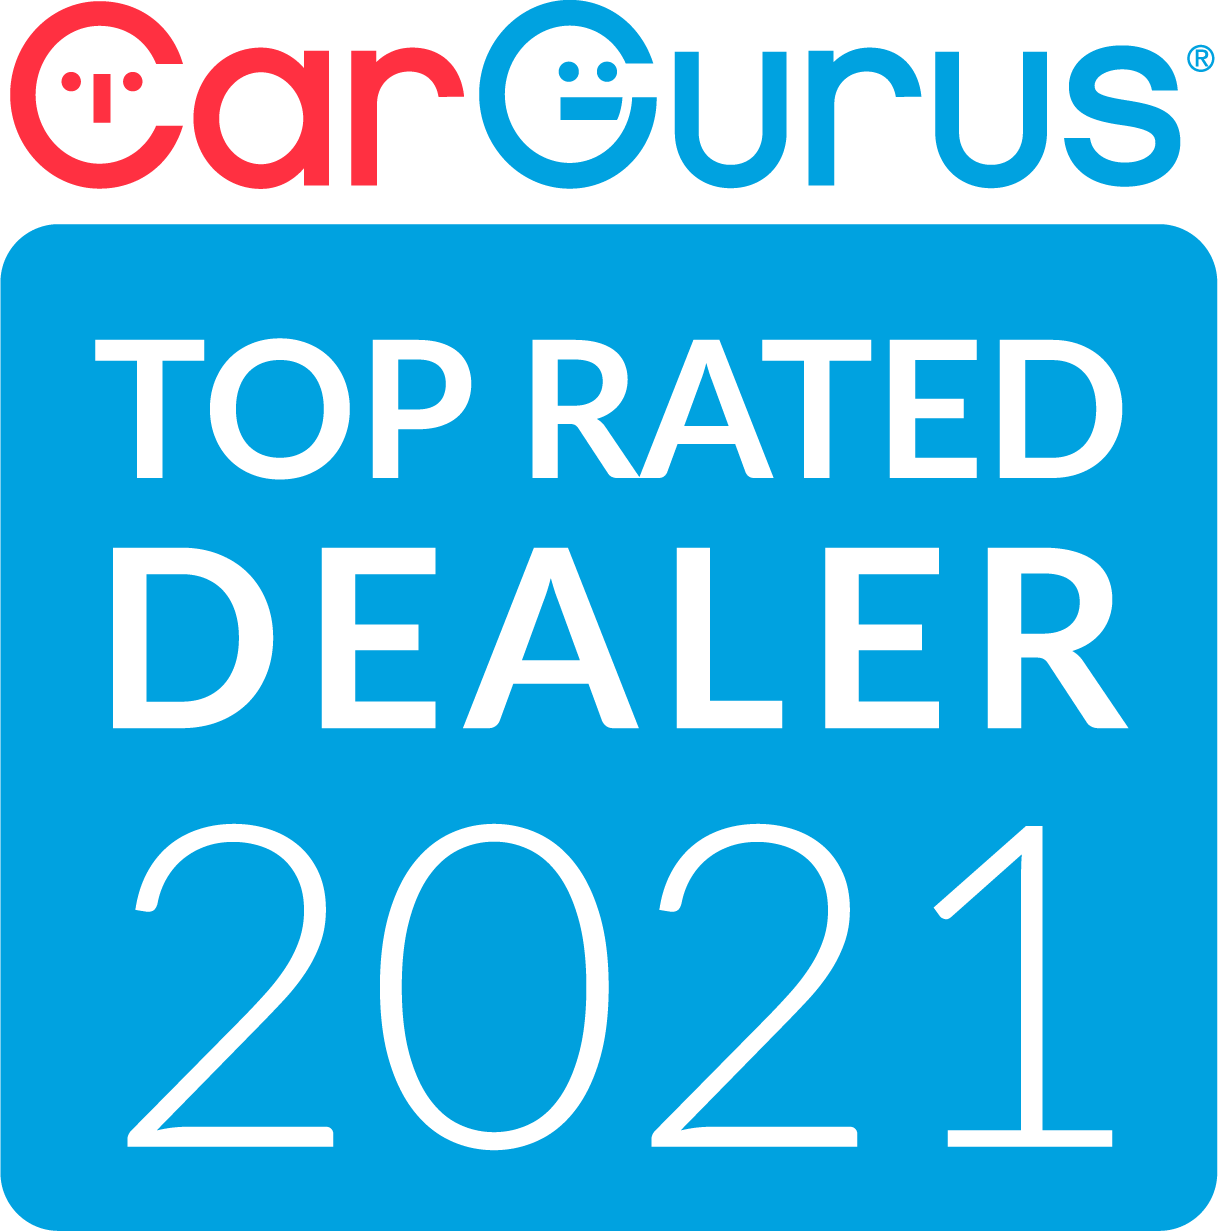 CarGurus Top Rated Dealer 2021 Badge